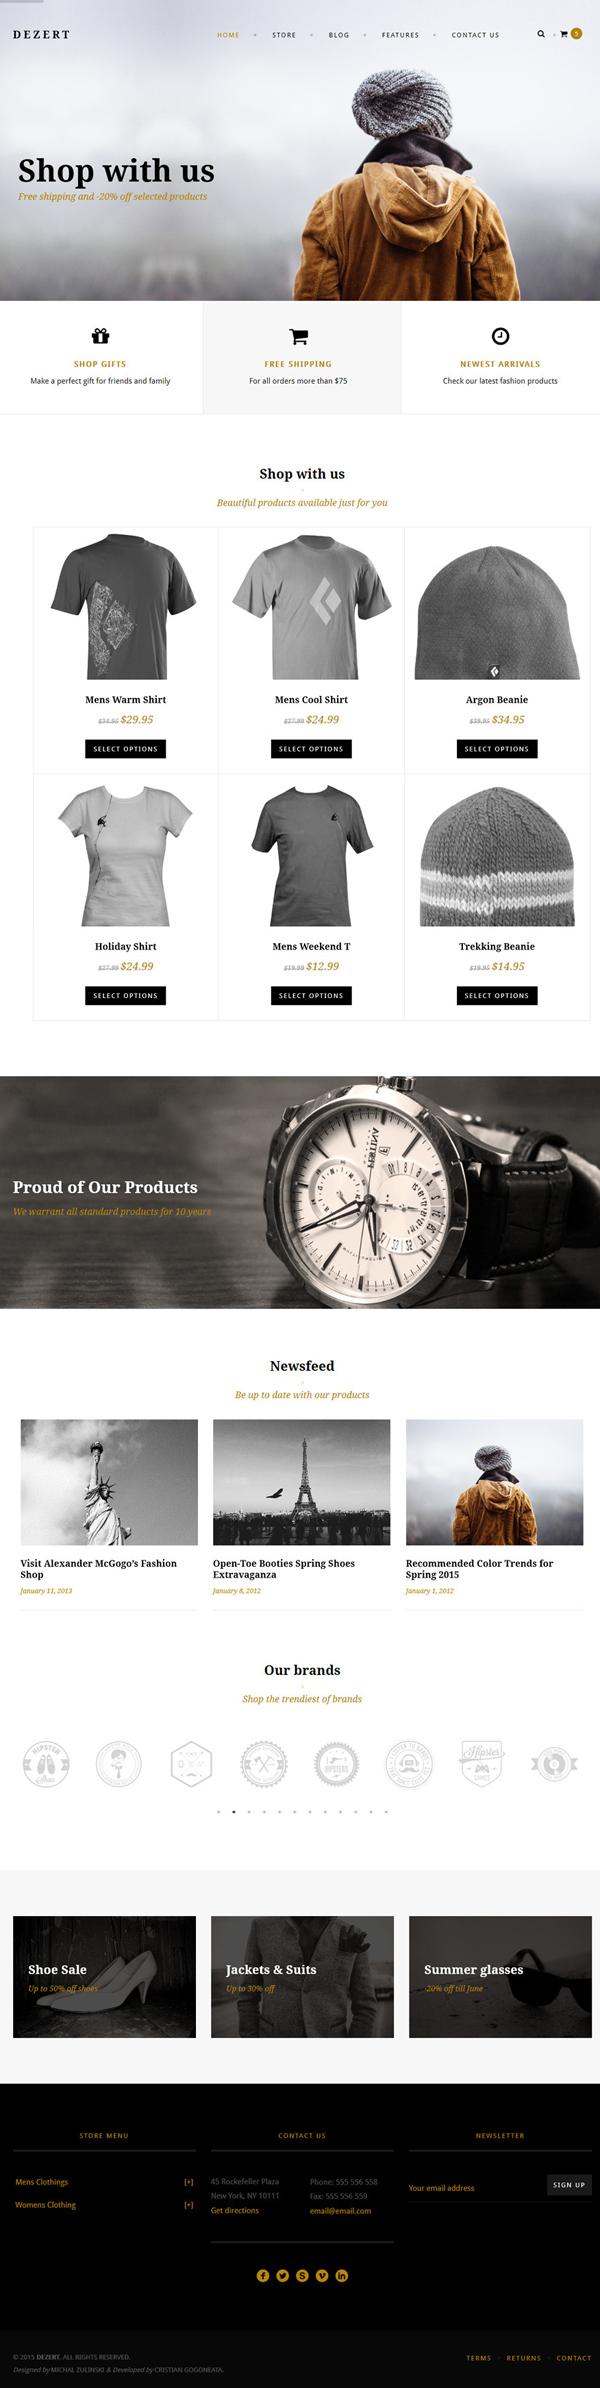 Dezert - WP EasyCart & WooCommerce Shopping Theme